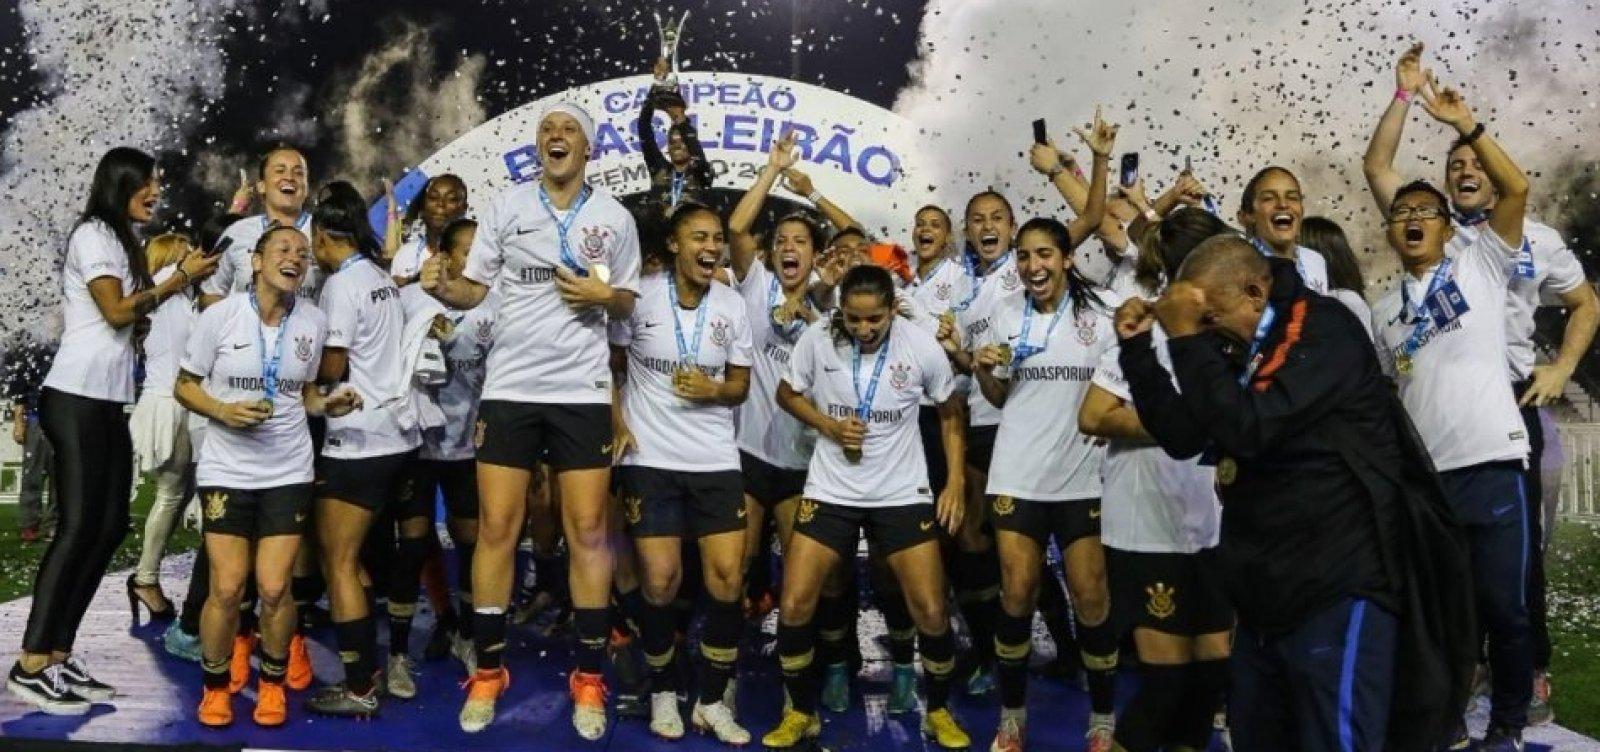 [Band vai exibir Campeonato Brasileiro de futebol feminino]